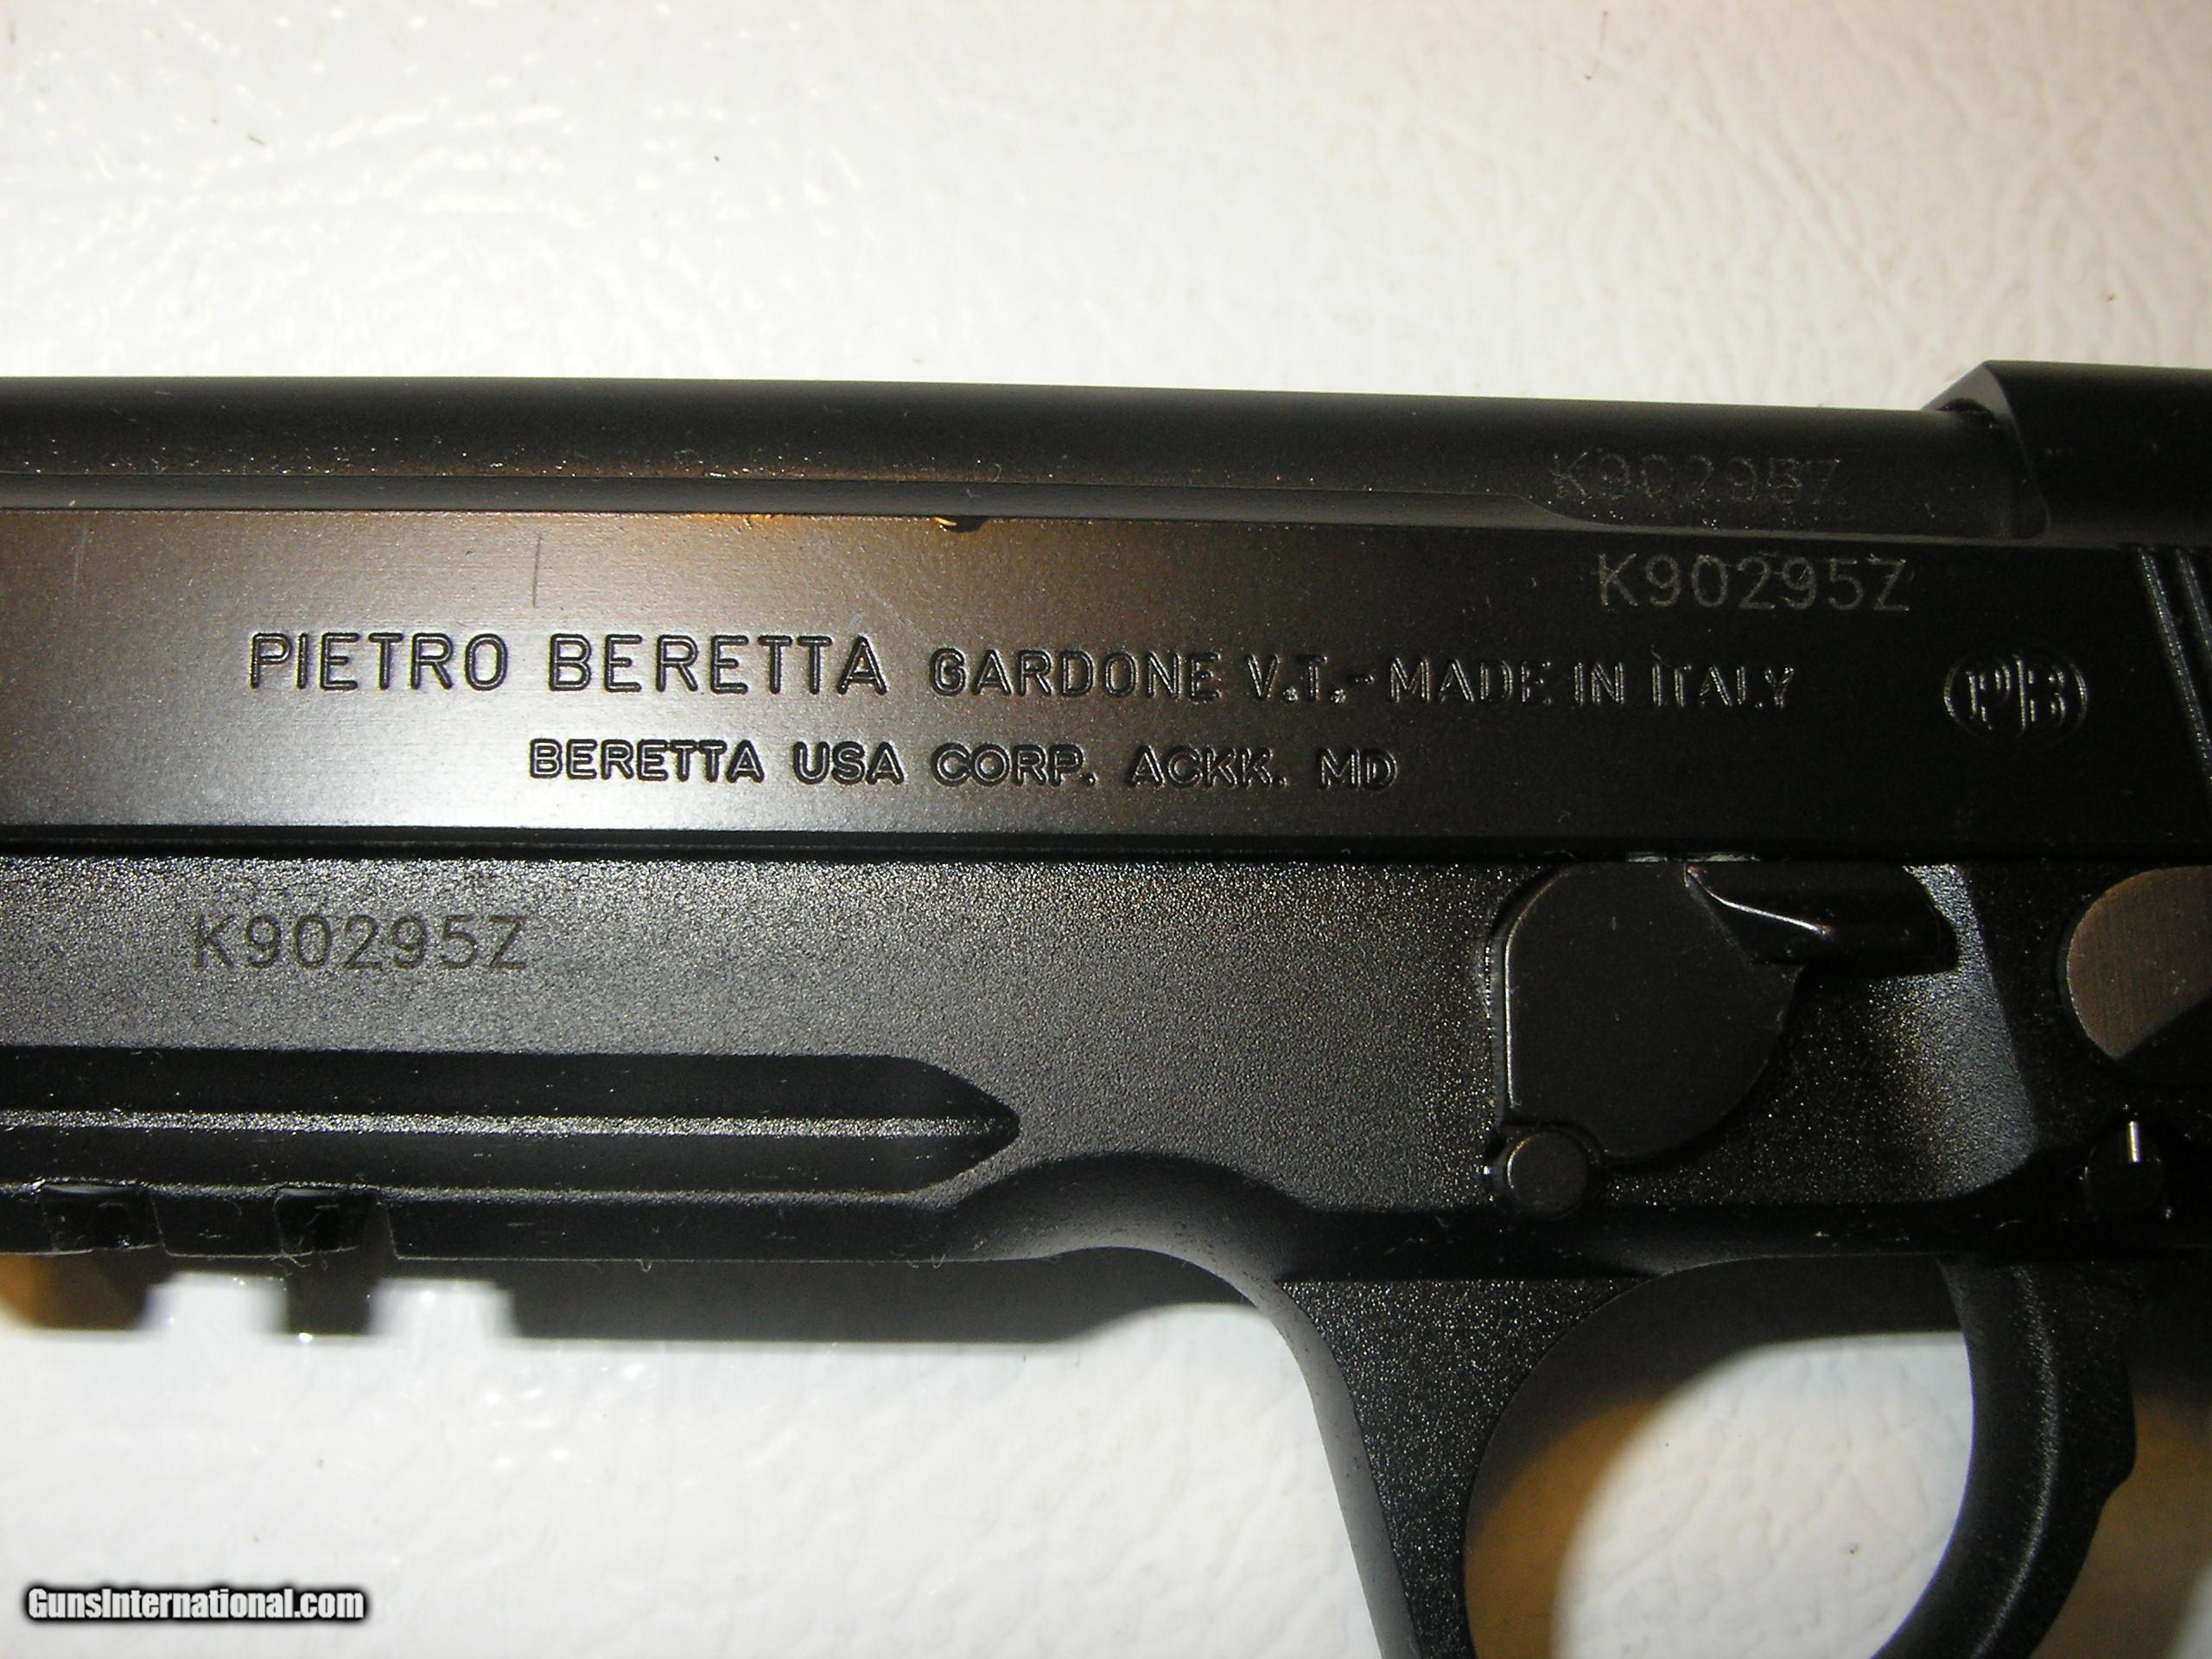 BERETTA 92-A1, 9-MM, 3-17 ROUND MAGAZINES, COMBAT SIGHTS, 4 9